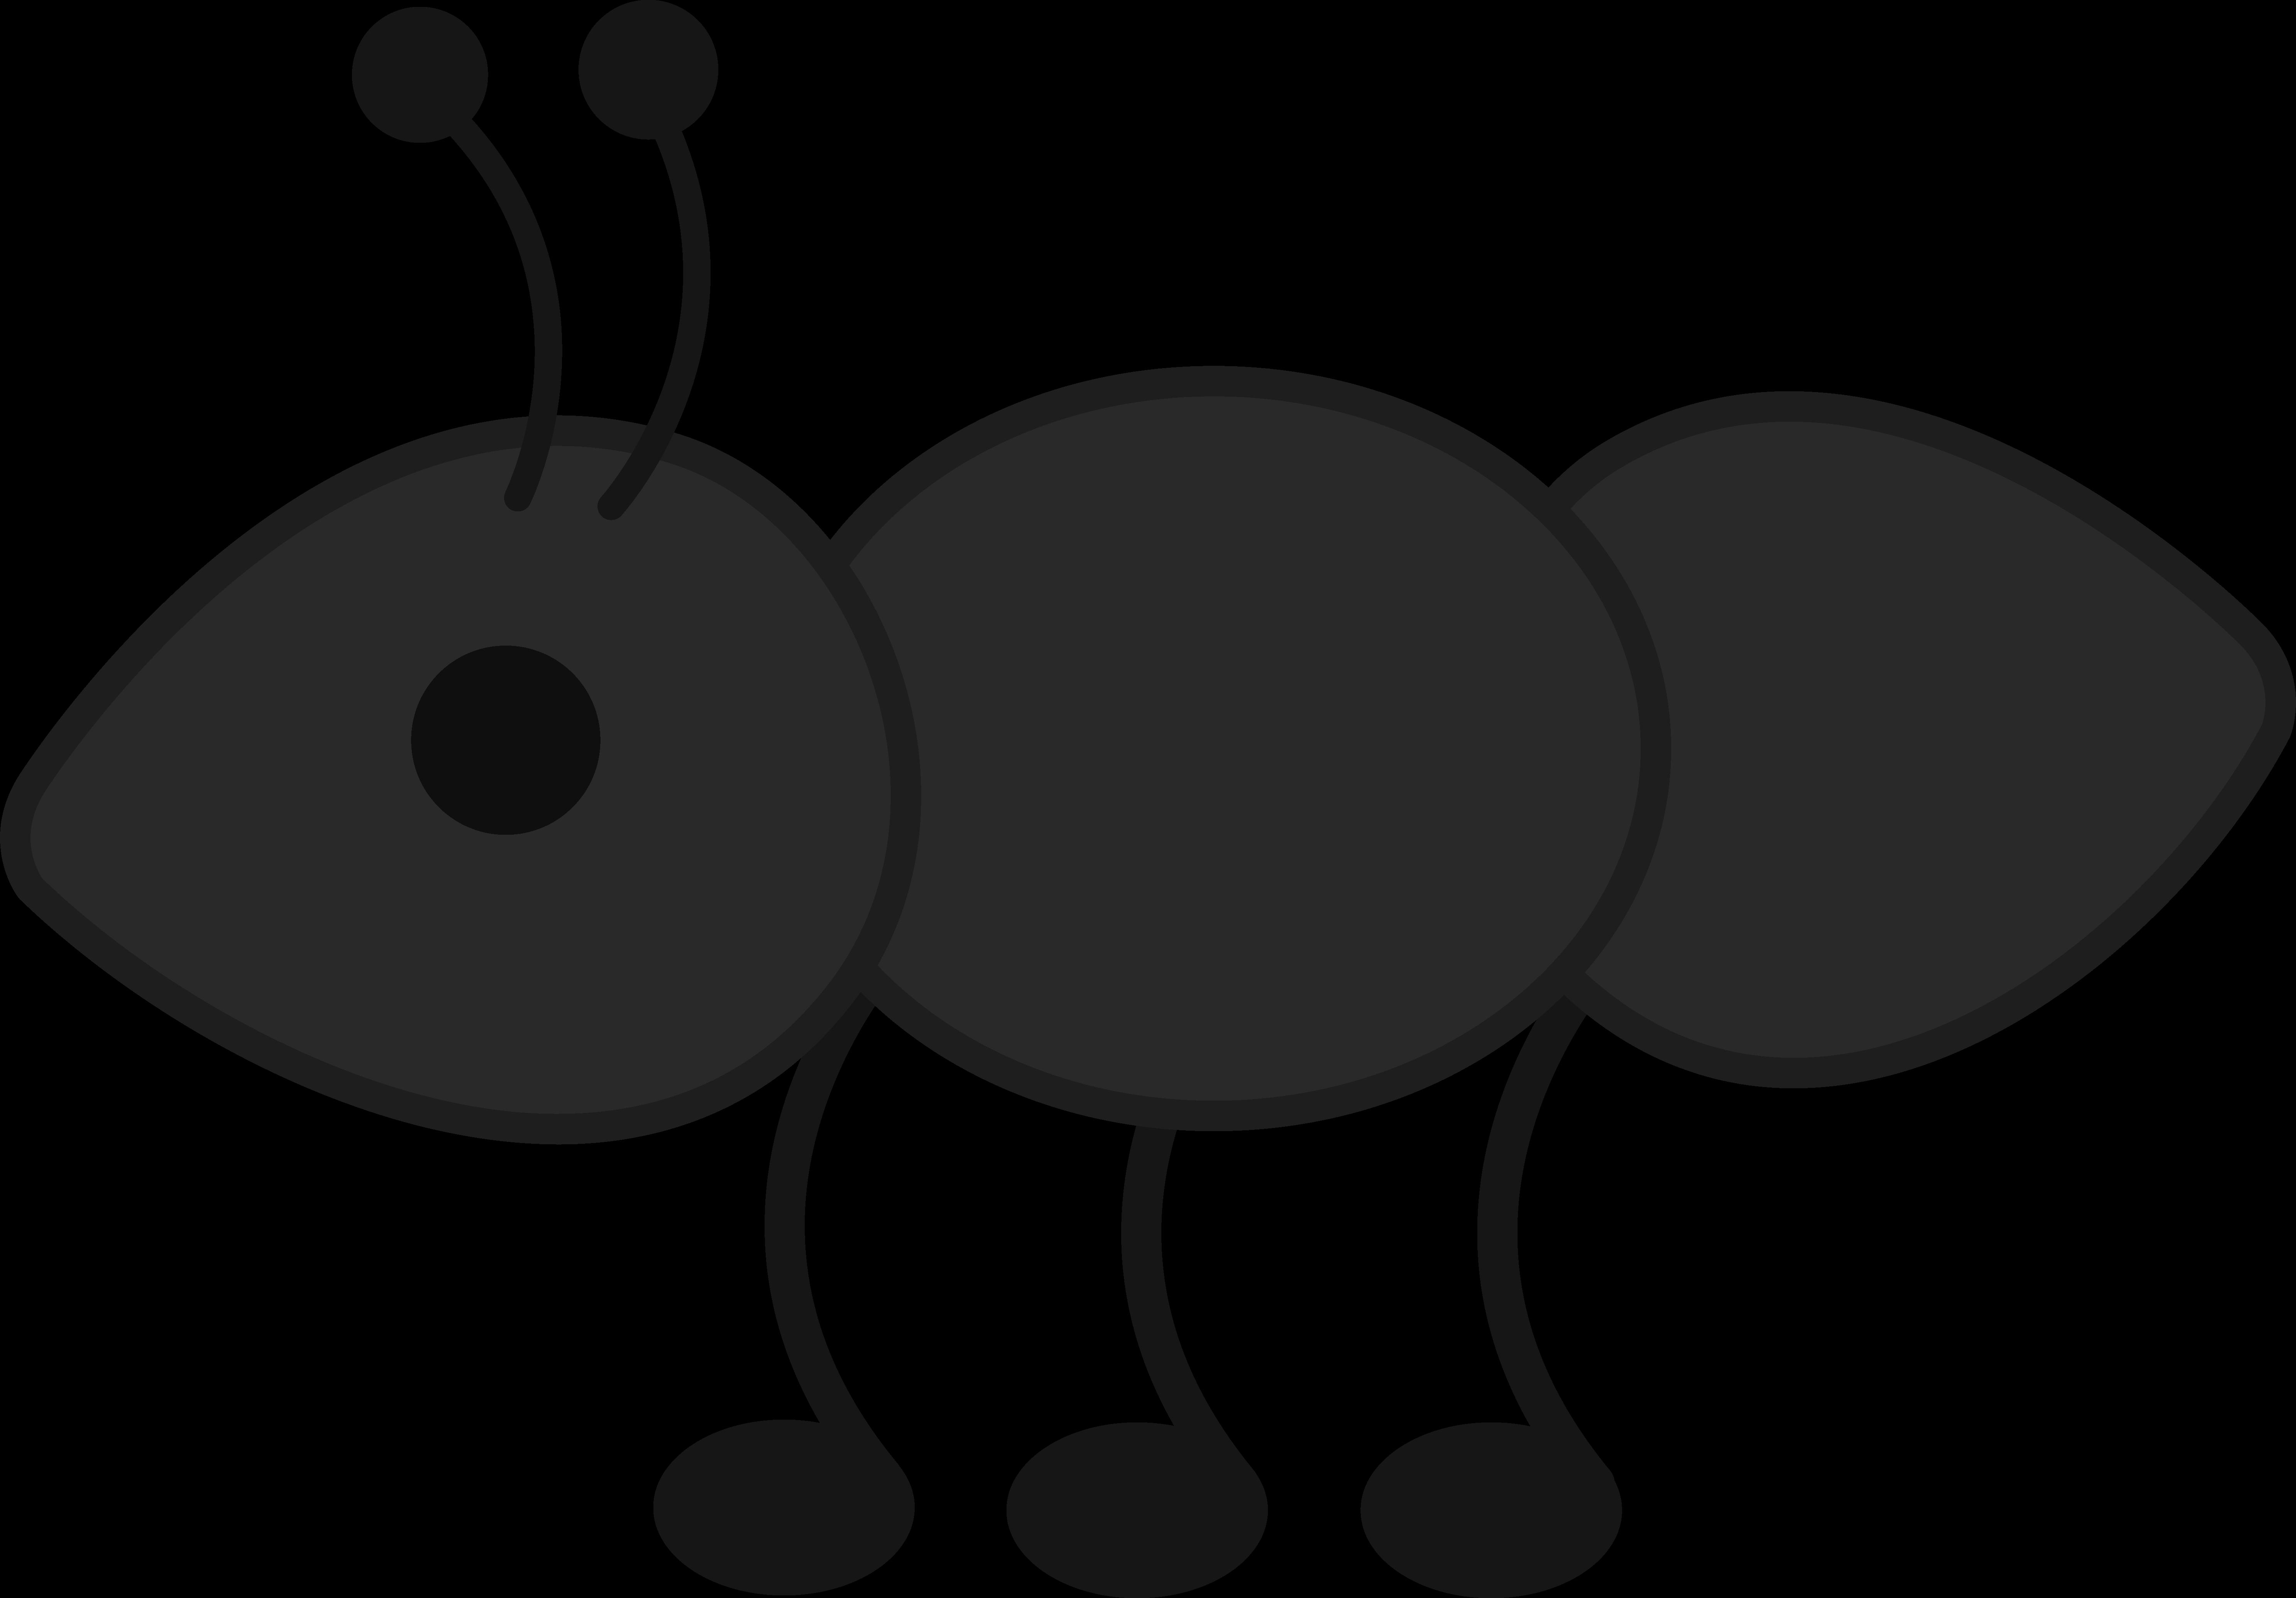 Fire clipartblack com animal. Ant clipart gray